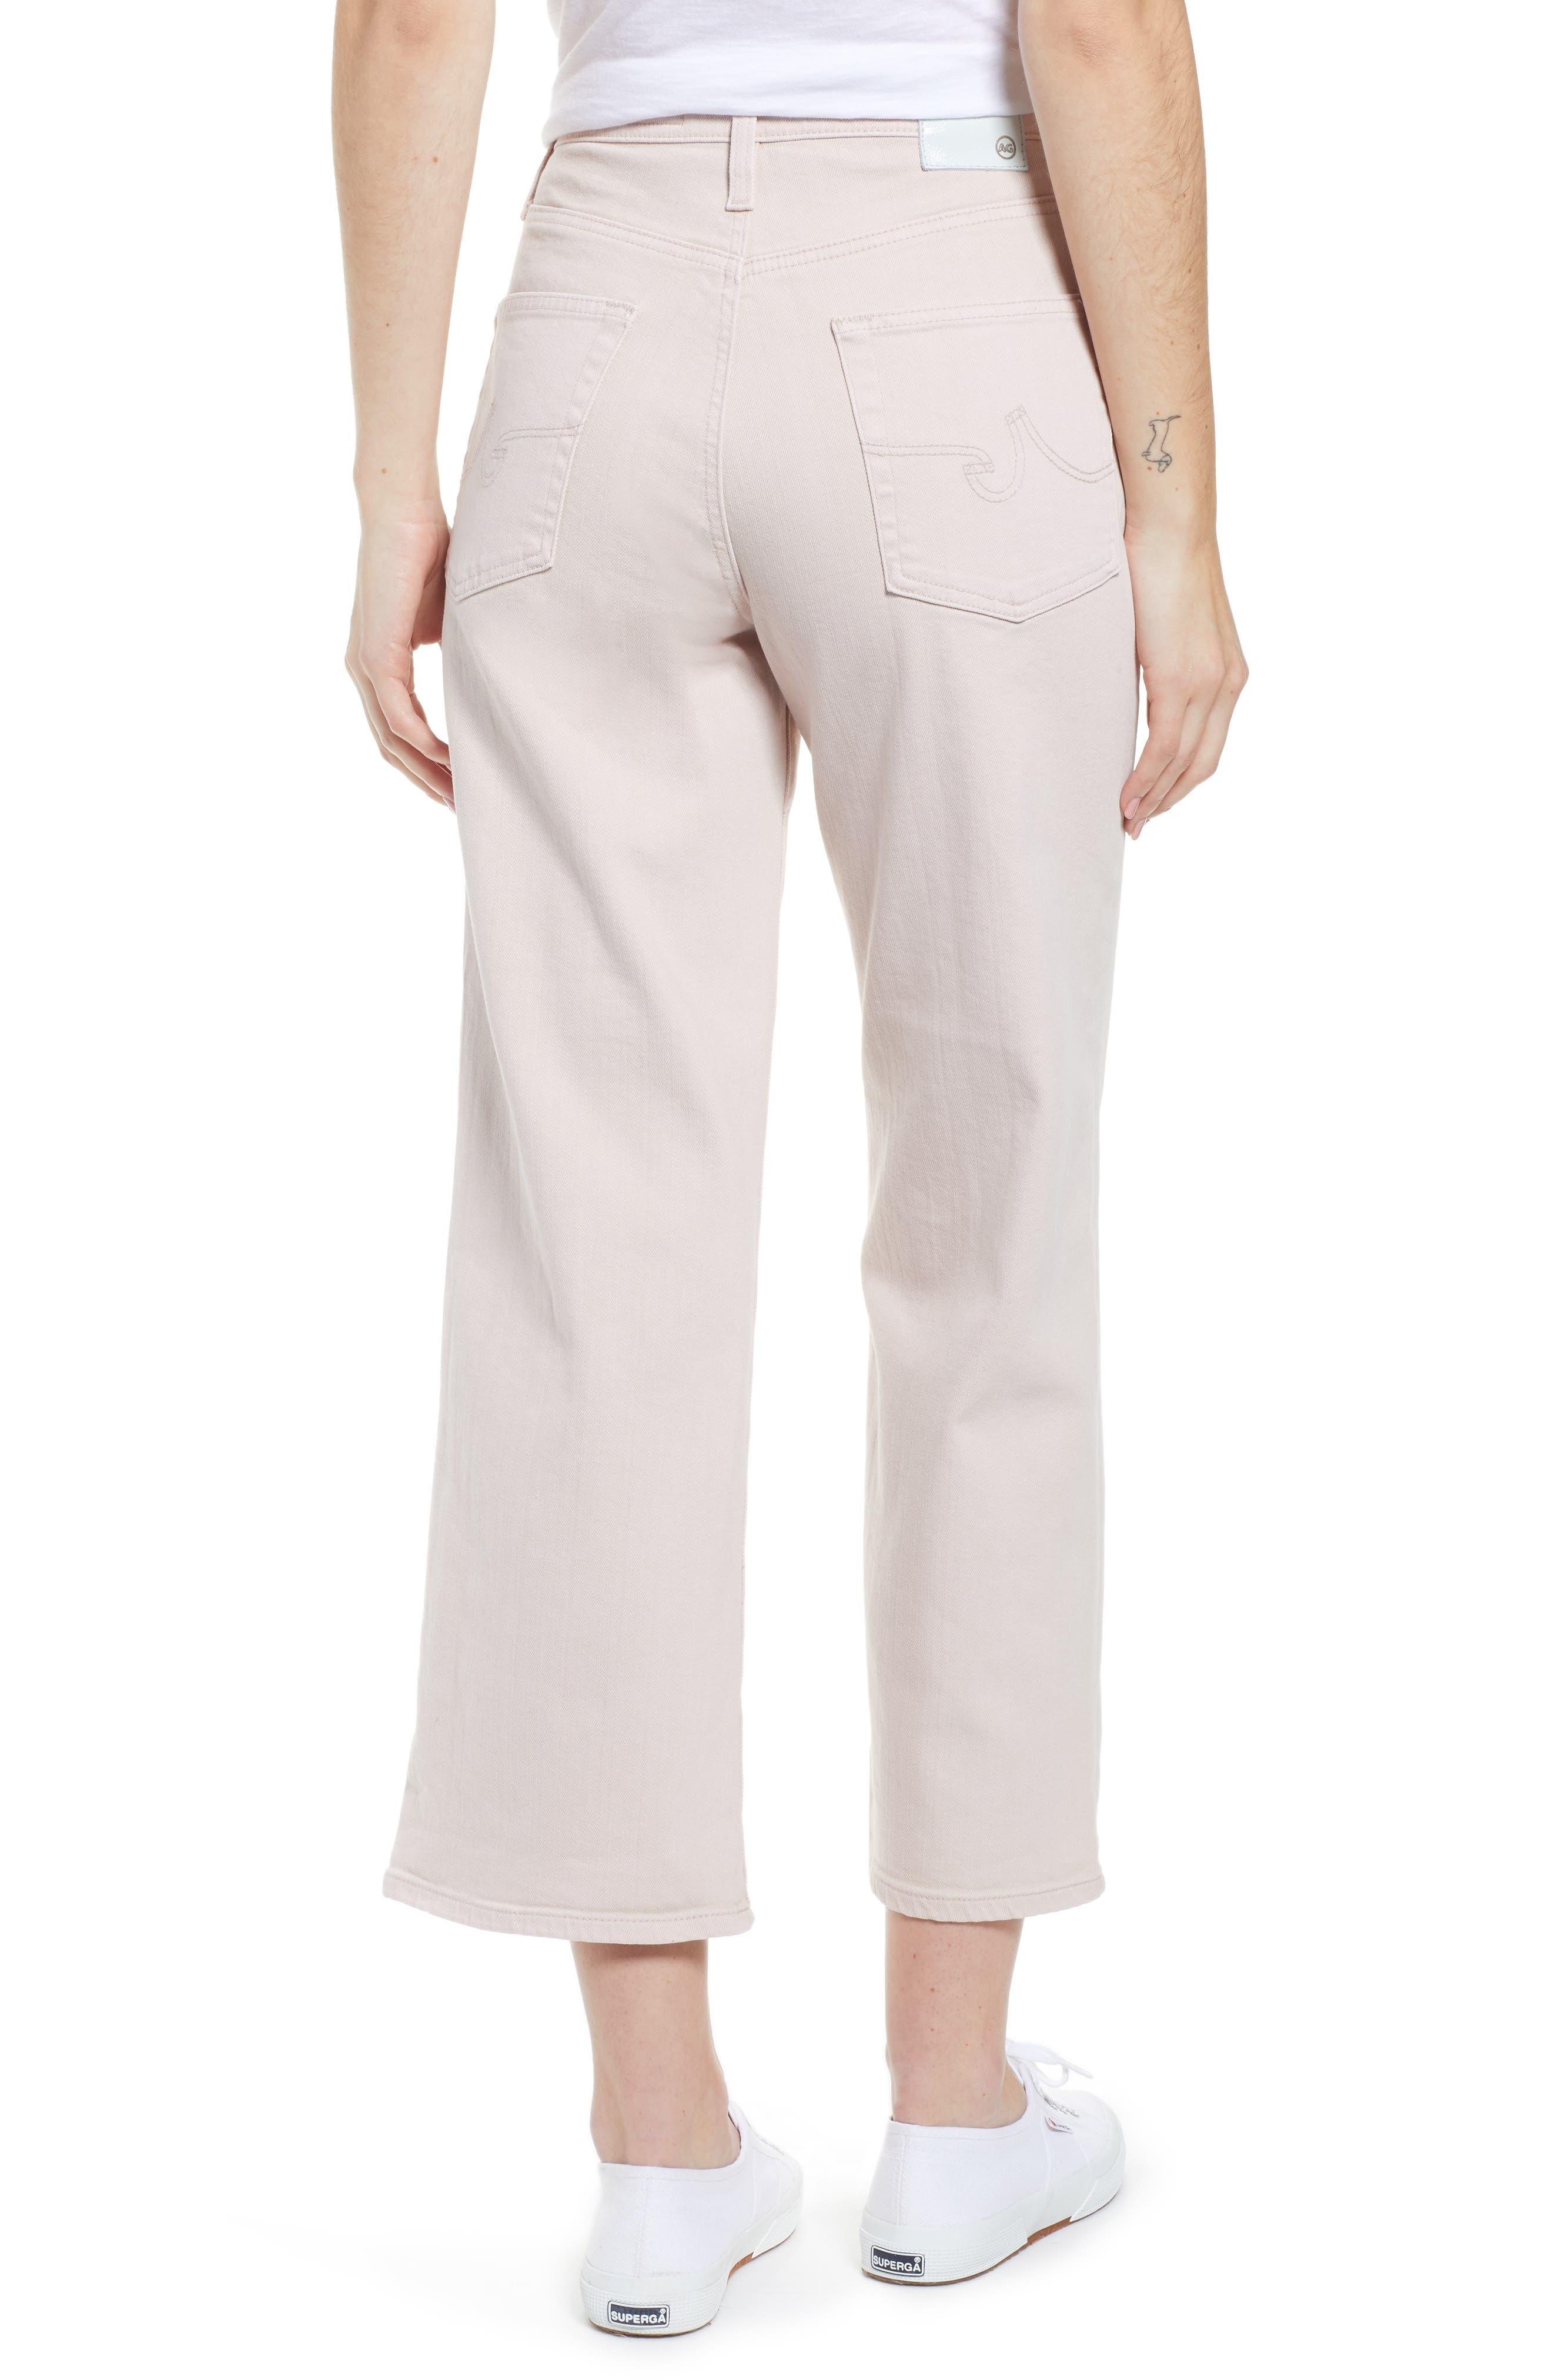 AG, Etta High Waist Crop Wide Leg Jeans, Alternate thumbnail 2, color, SULFUR PEAKED PINK